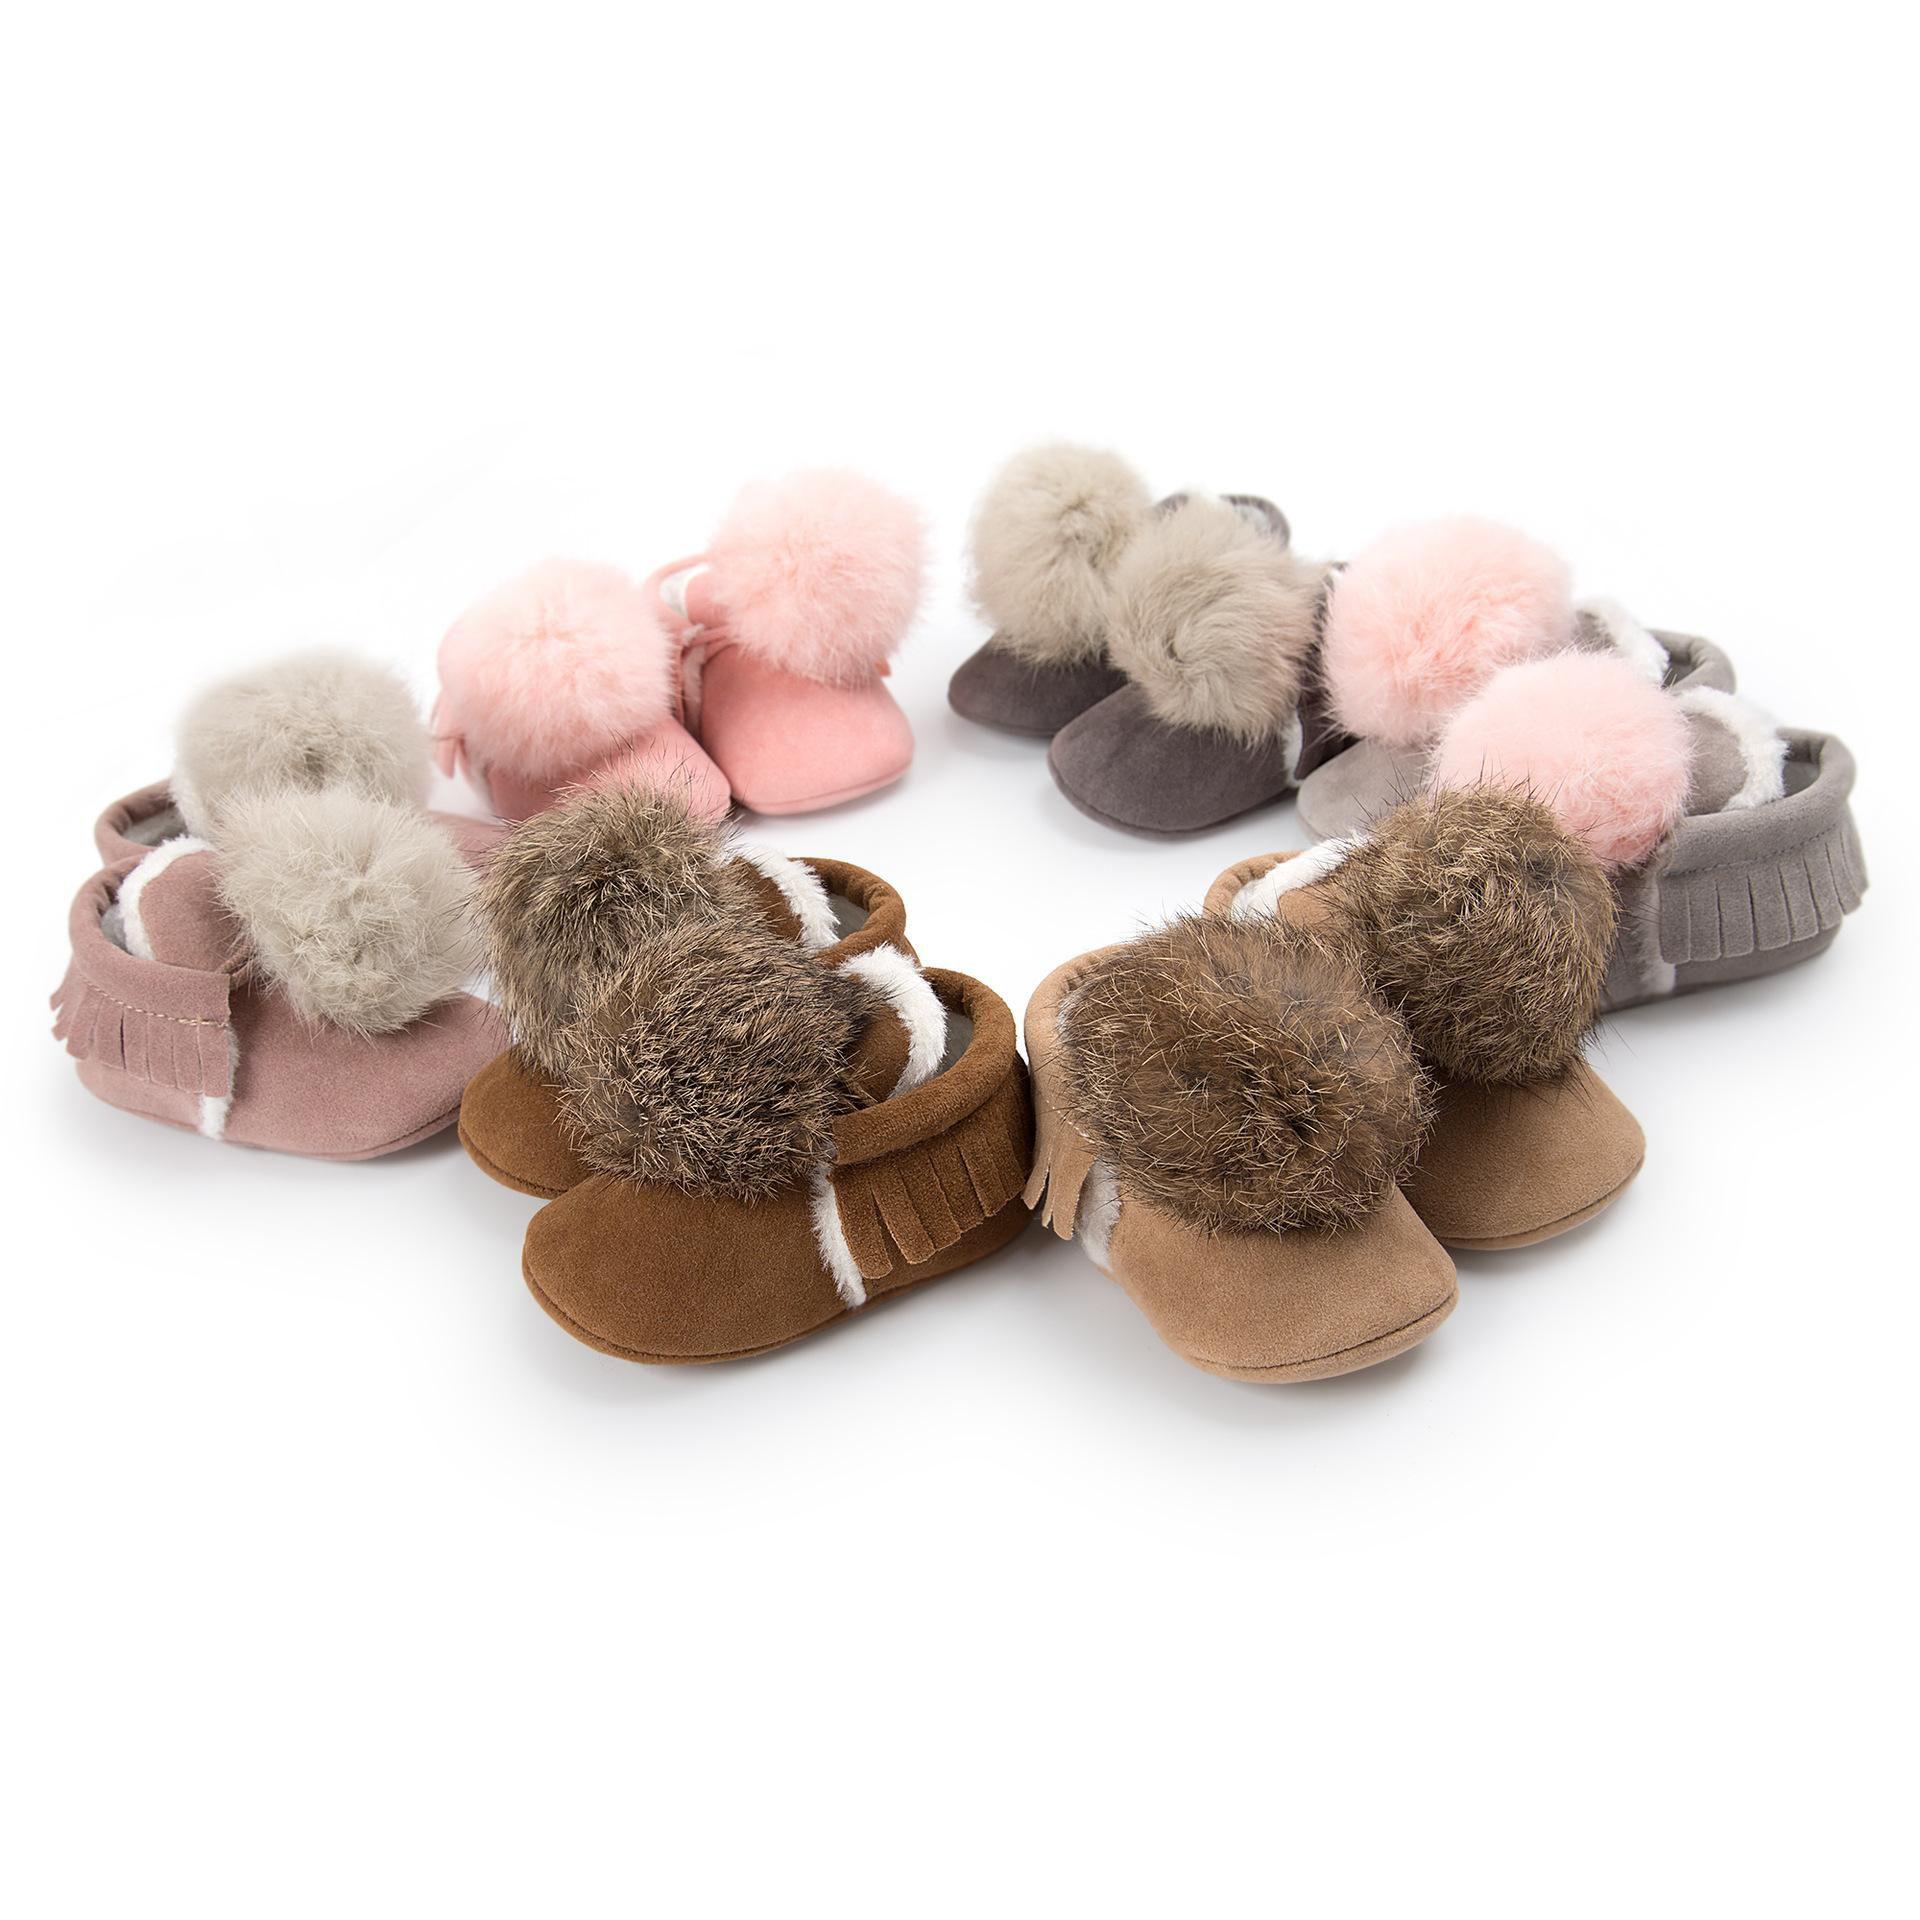 Tassel Baby Shoes Winter big pompon Infant first walkers soft moccasins Girls Boys thicken velvet Toddler outdoor shoes